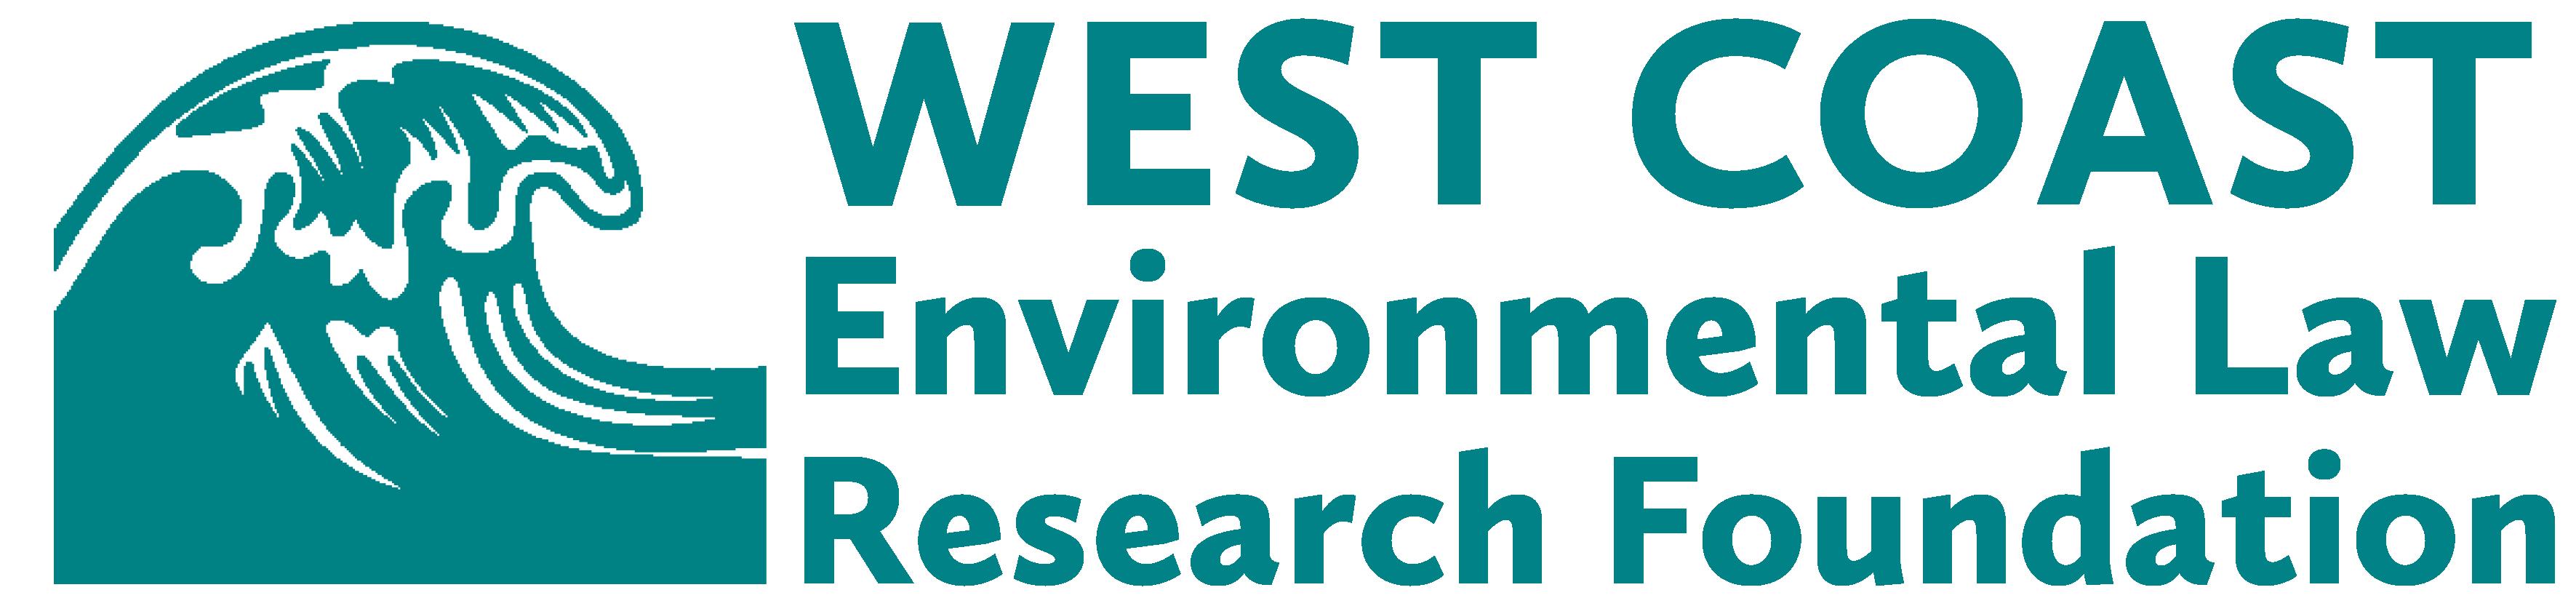 West Coast Envrinmental Law Research Foundation